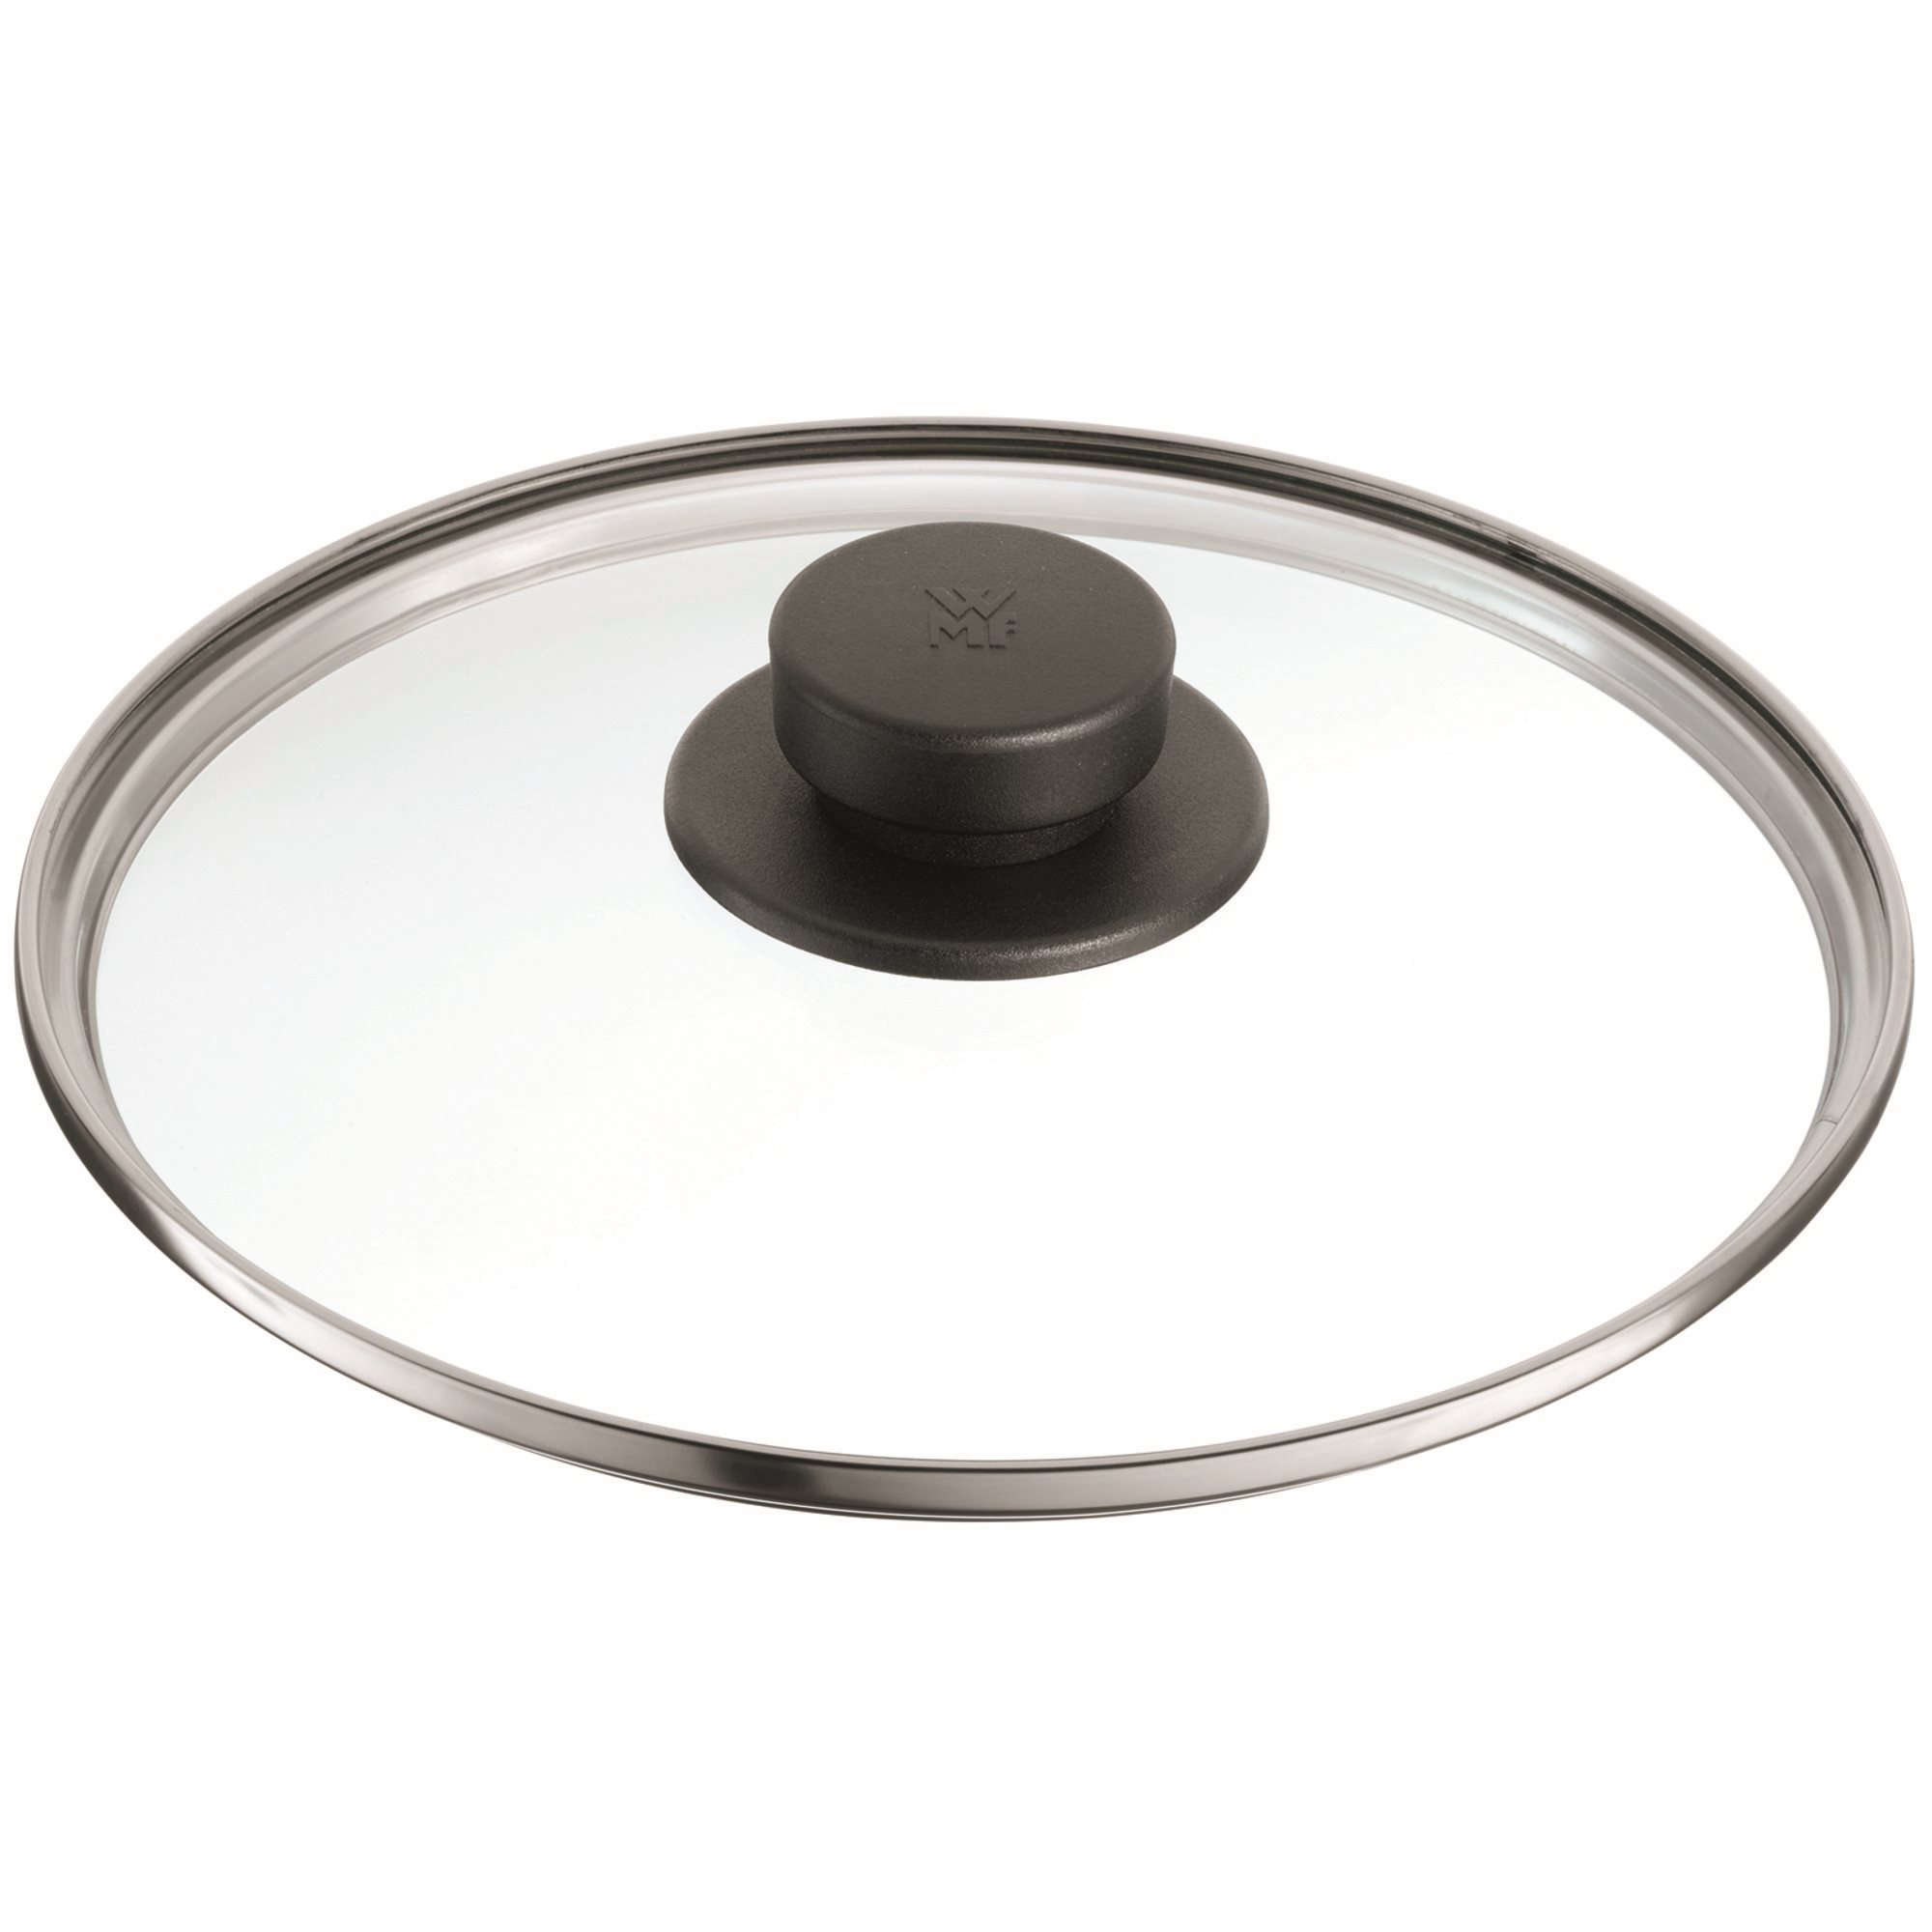 wmf profi select glasdeckel f r pfannen 28 cm ebay. Black Bedroom Furniture Sets. Home Design Ideas